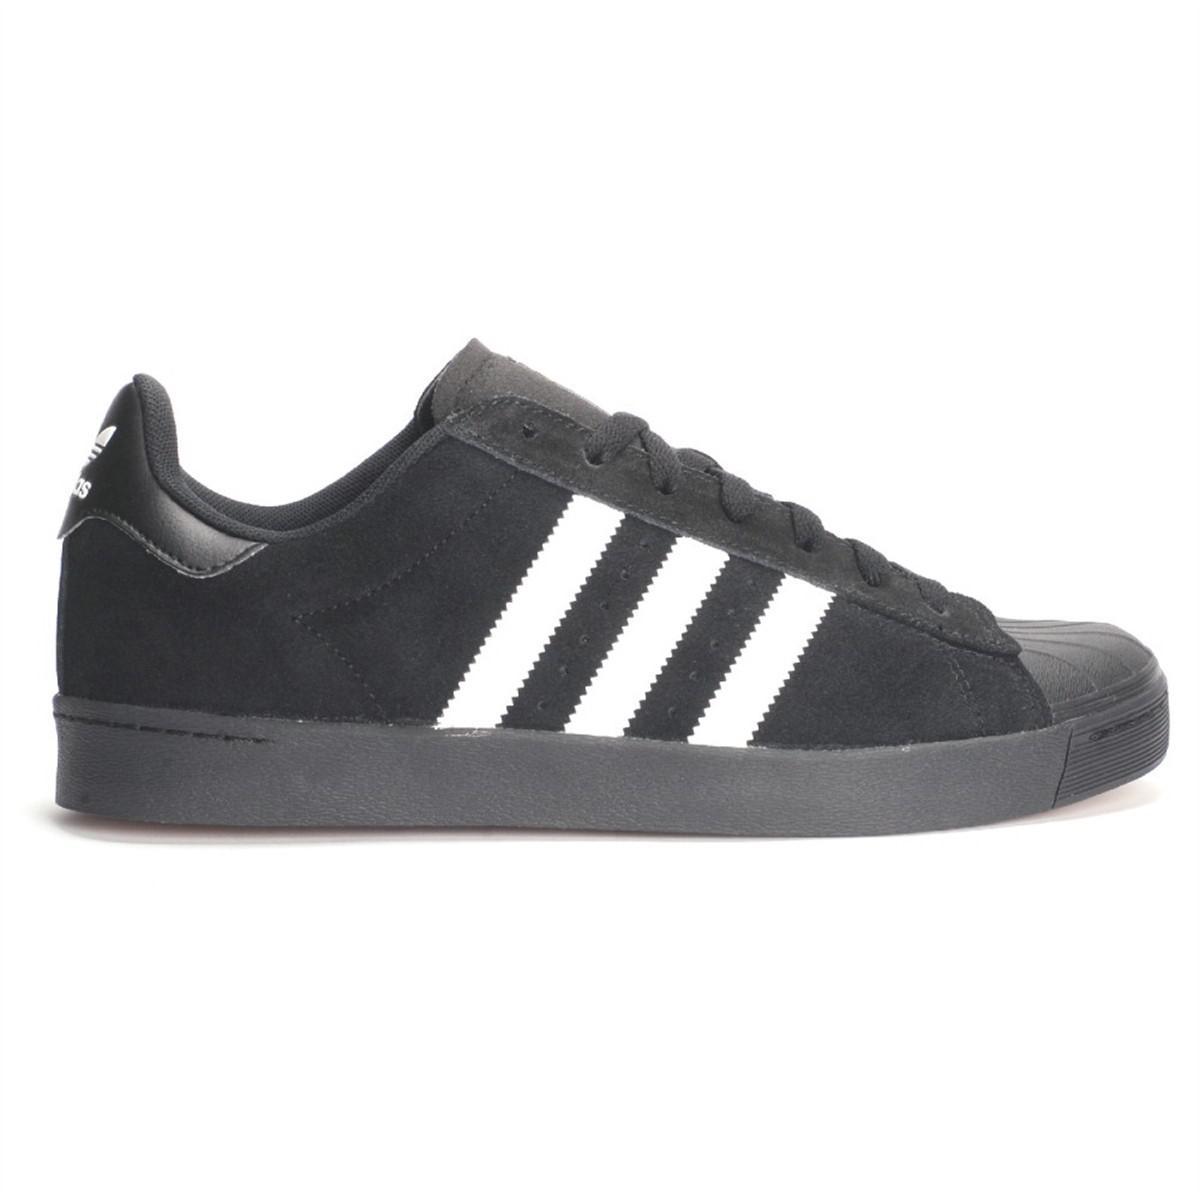 promo code 6c7ab c7d4a Lyst - Adidas Superstar Vulc Adv Blackftwwhtblack Skate Shoe